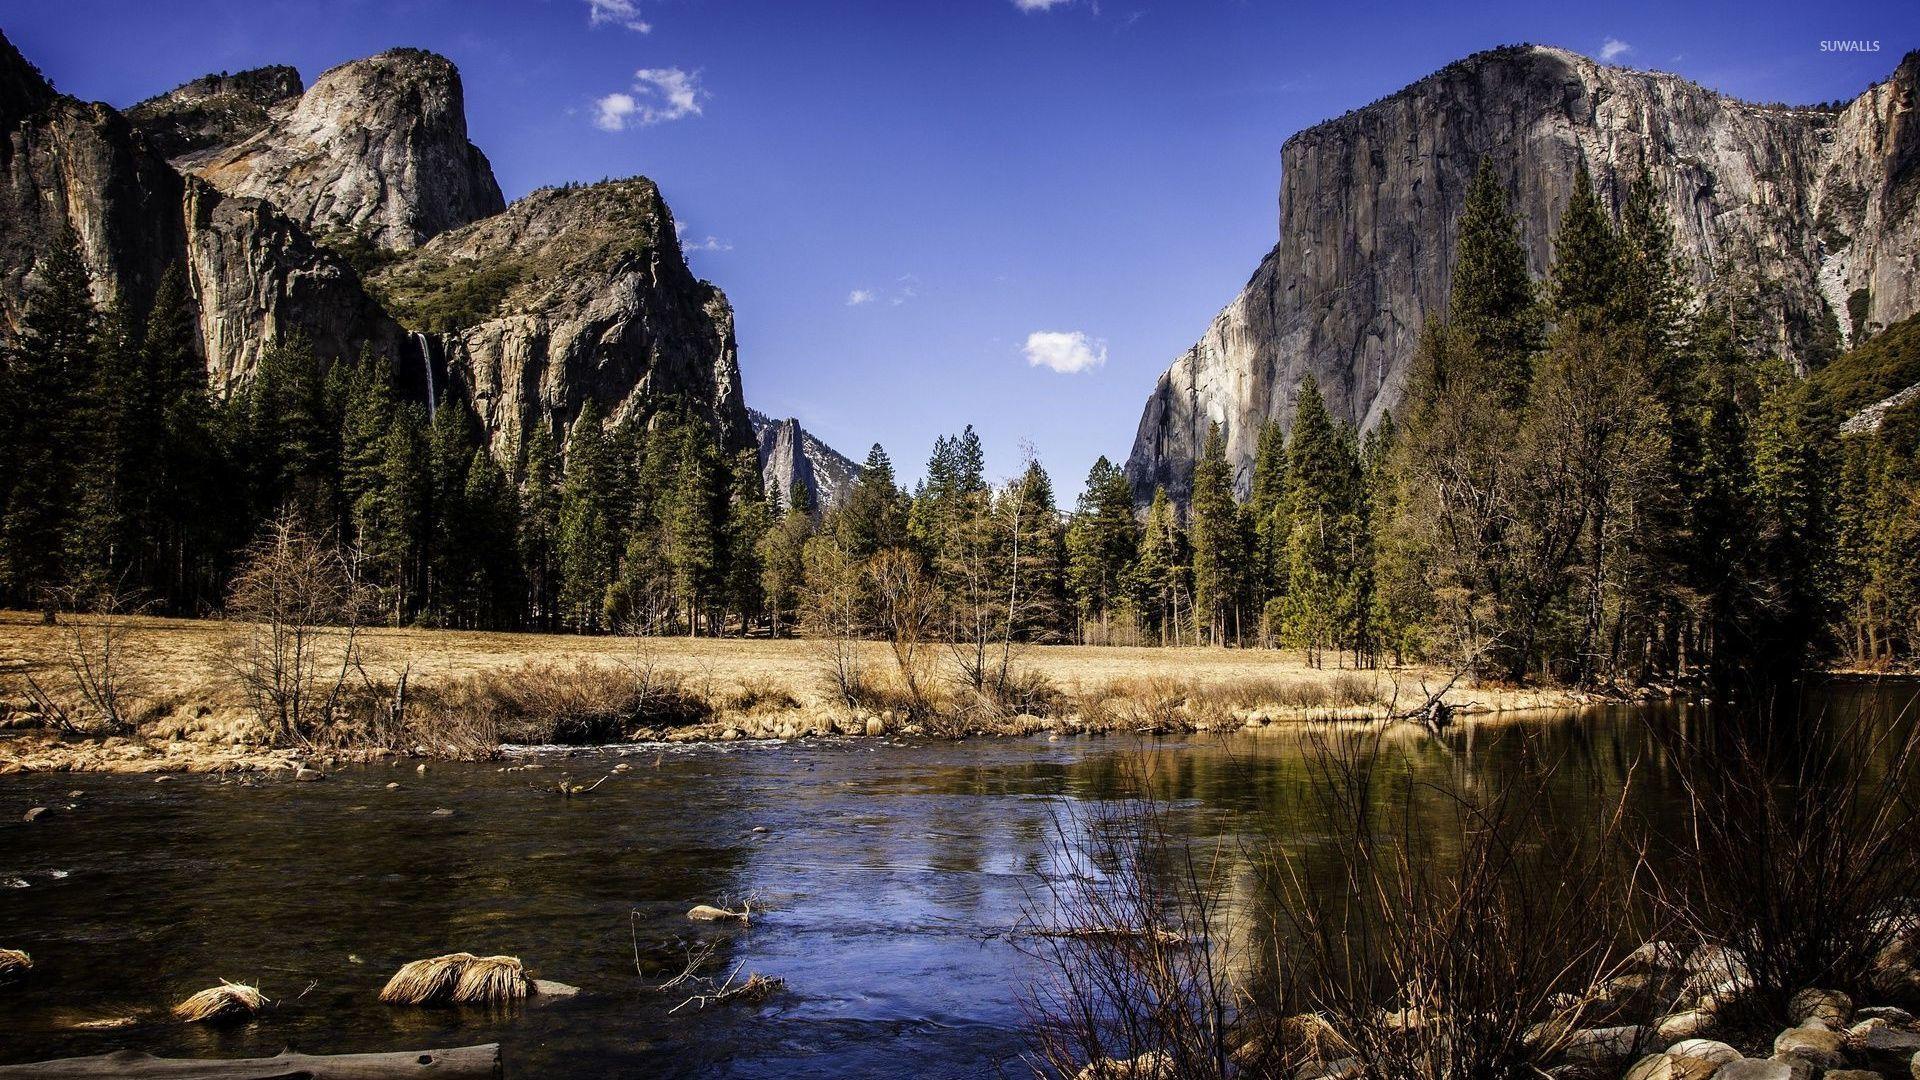 download rocky river wallpaper - photo #14